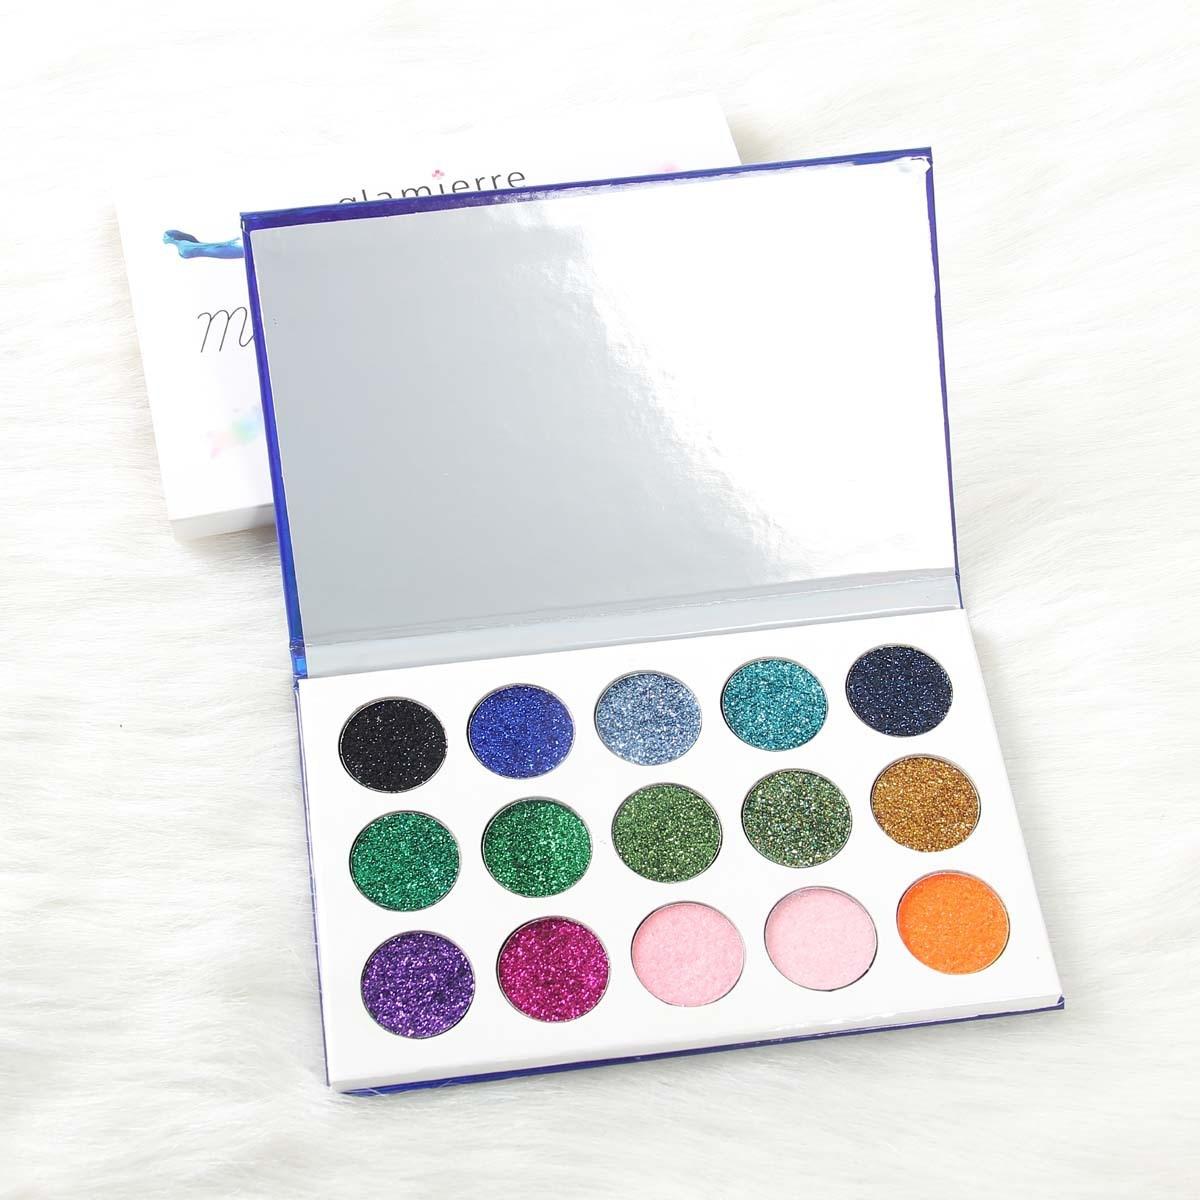 1 PC Classic Mermaid Eye Makeup Eye Shadow Sequins Shimmering Palette Eye Shadow 15 Color Durable Waterproof Shadow Cosmetics in Eye Shadow from Beauty Health